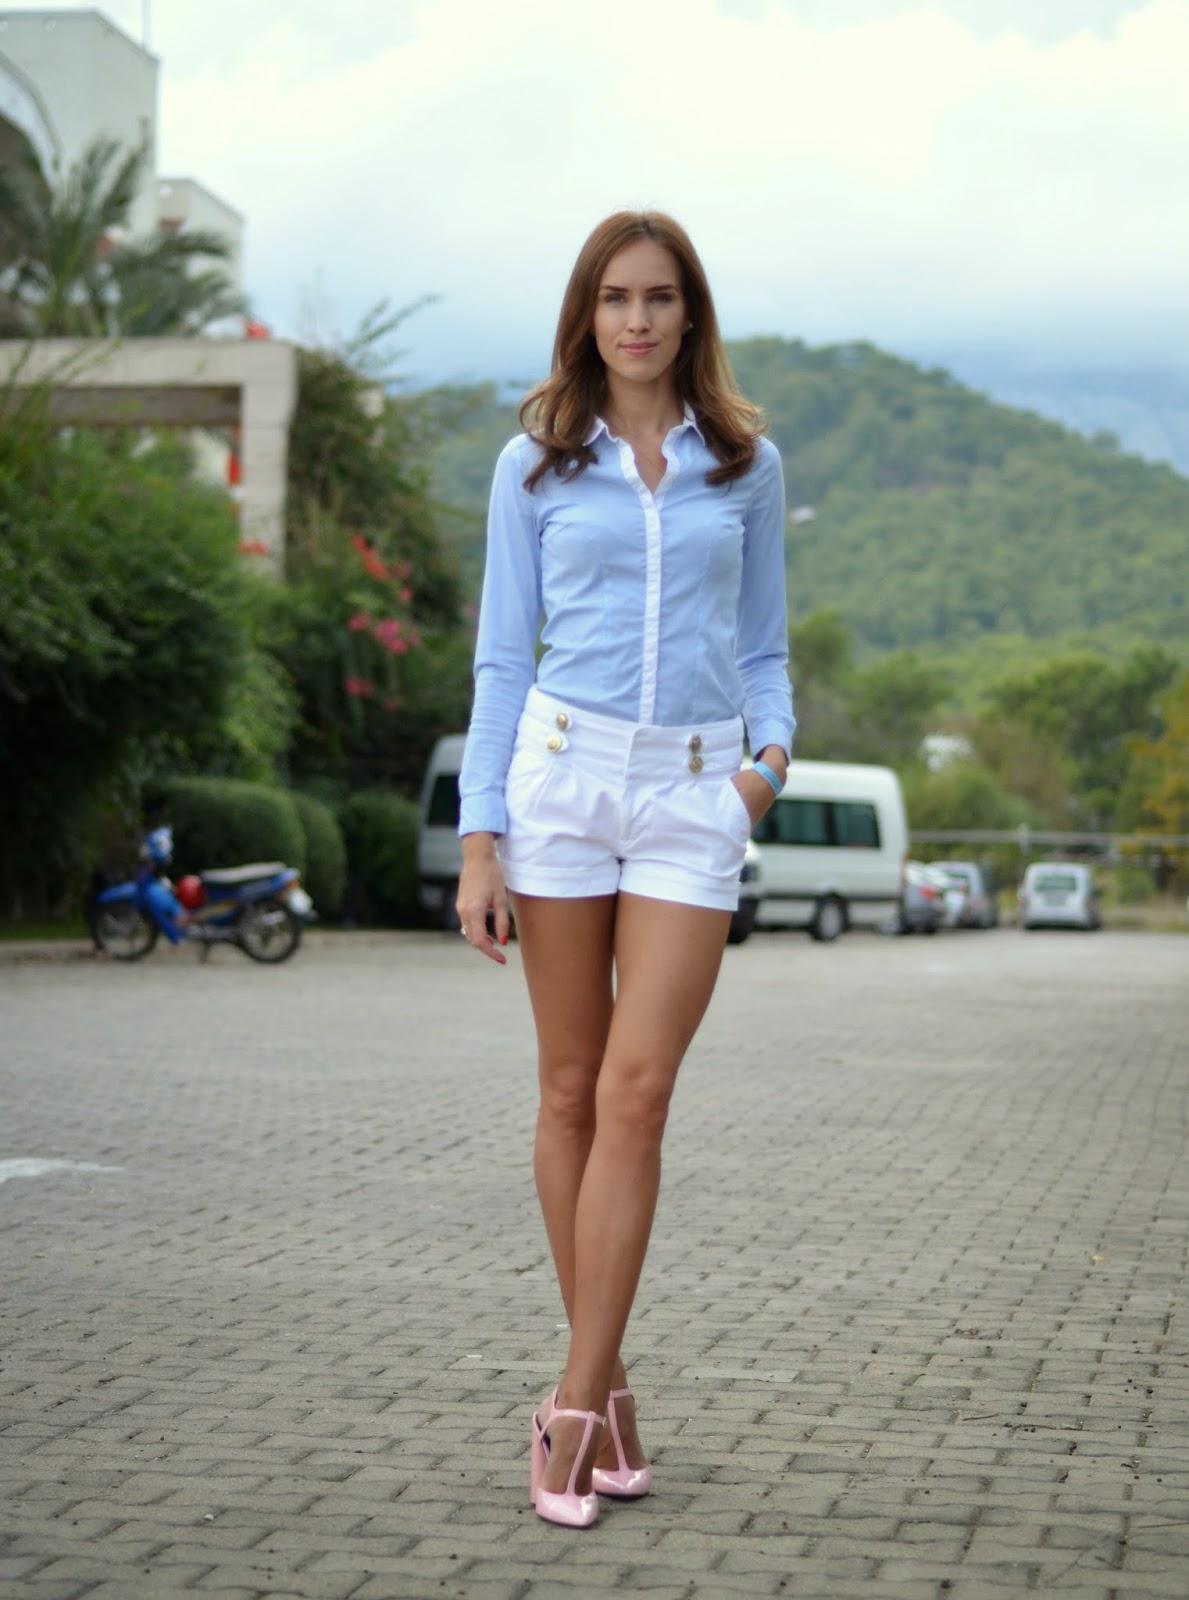 hm-shirt-mohito-white-shorts-zara-pink-strap-heels kristjaana mere